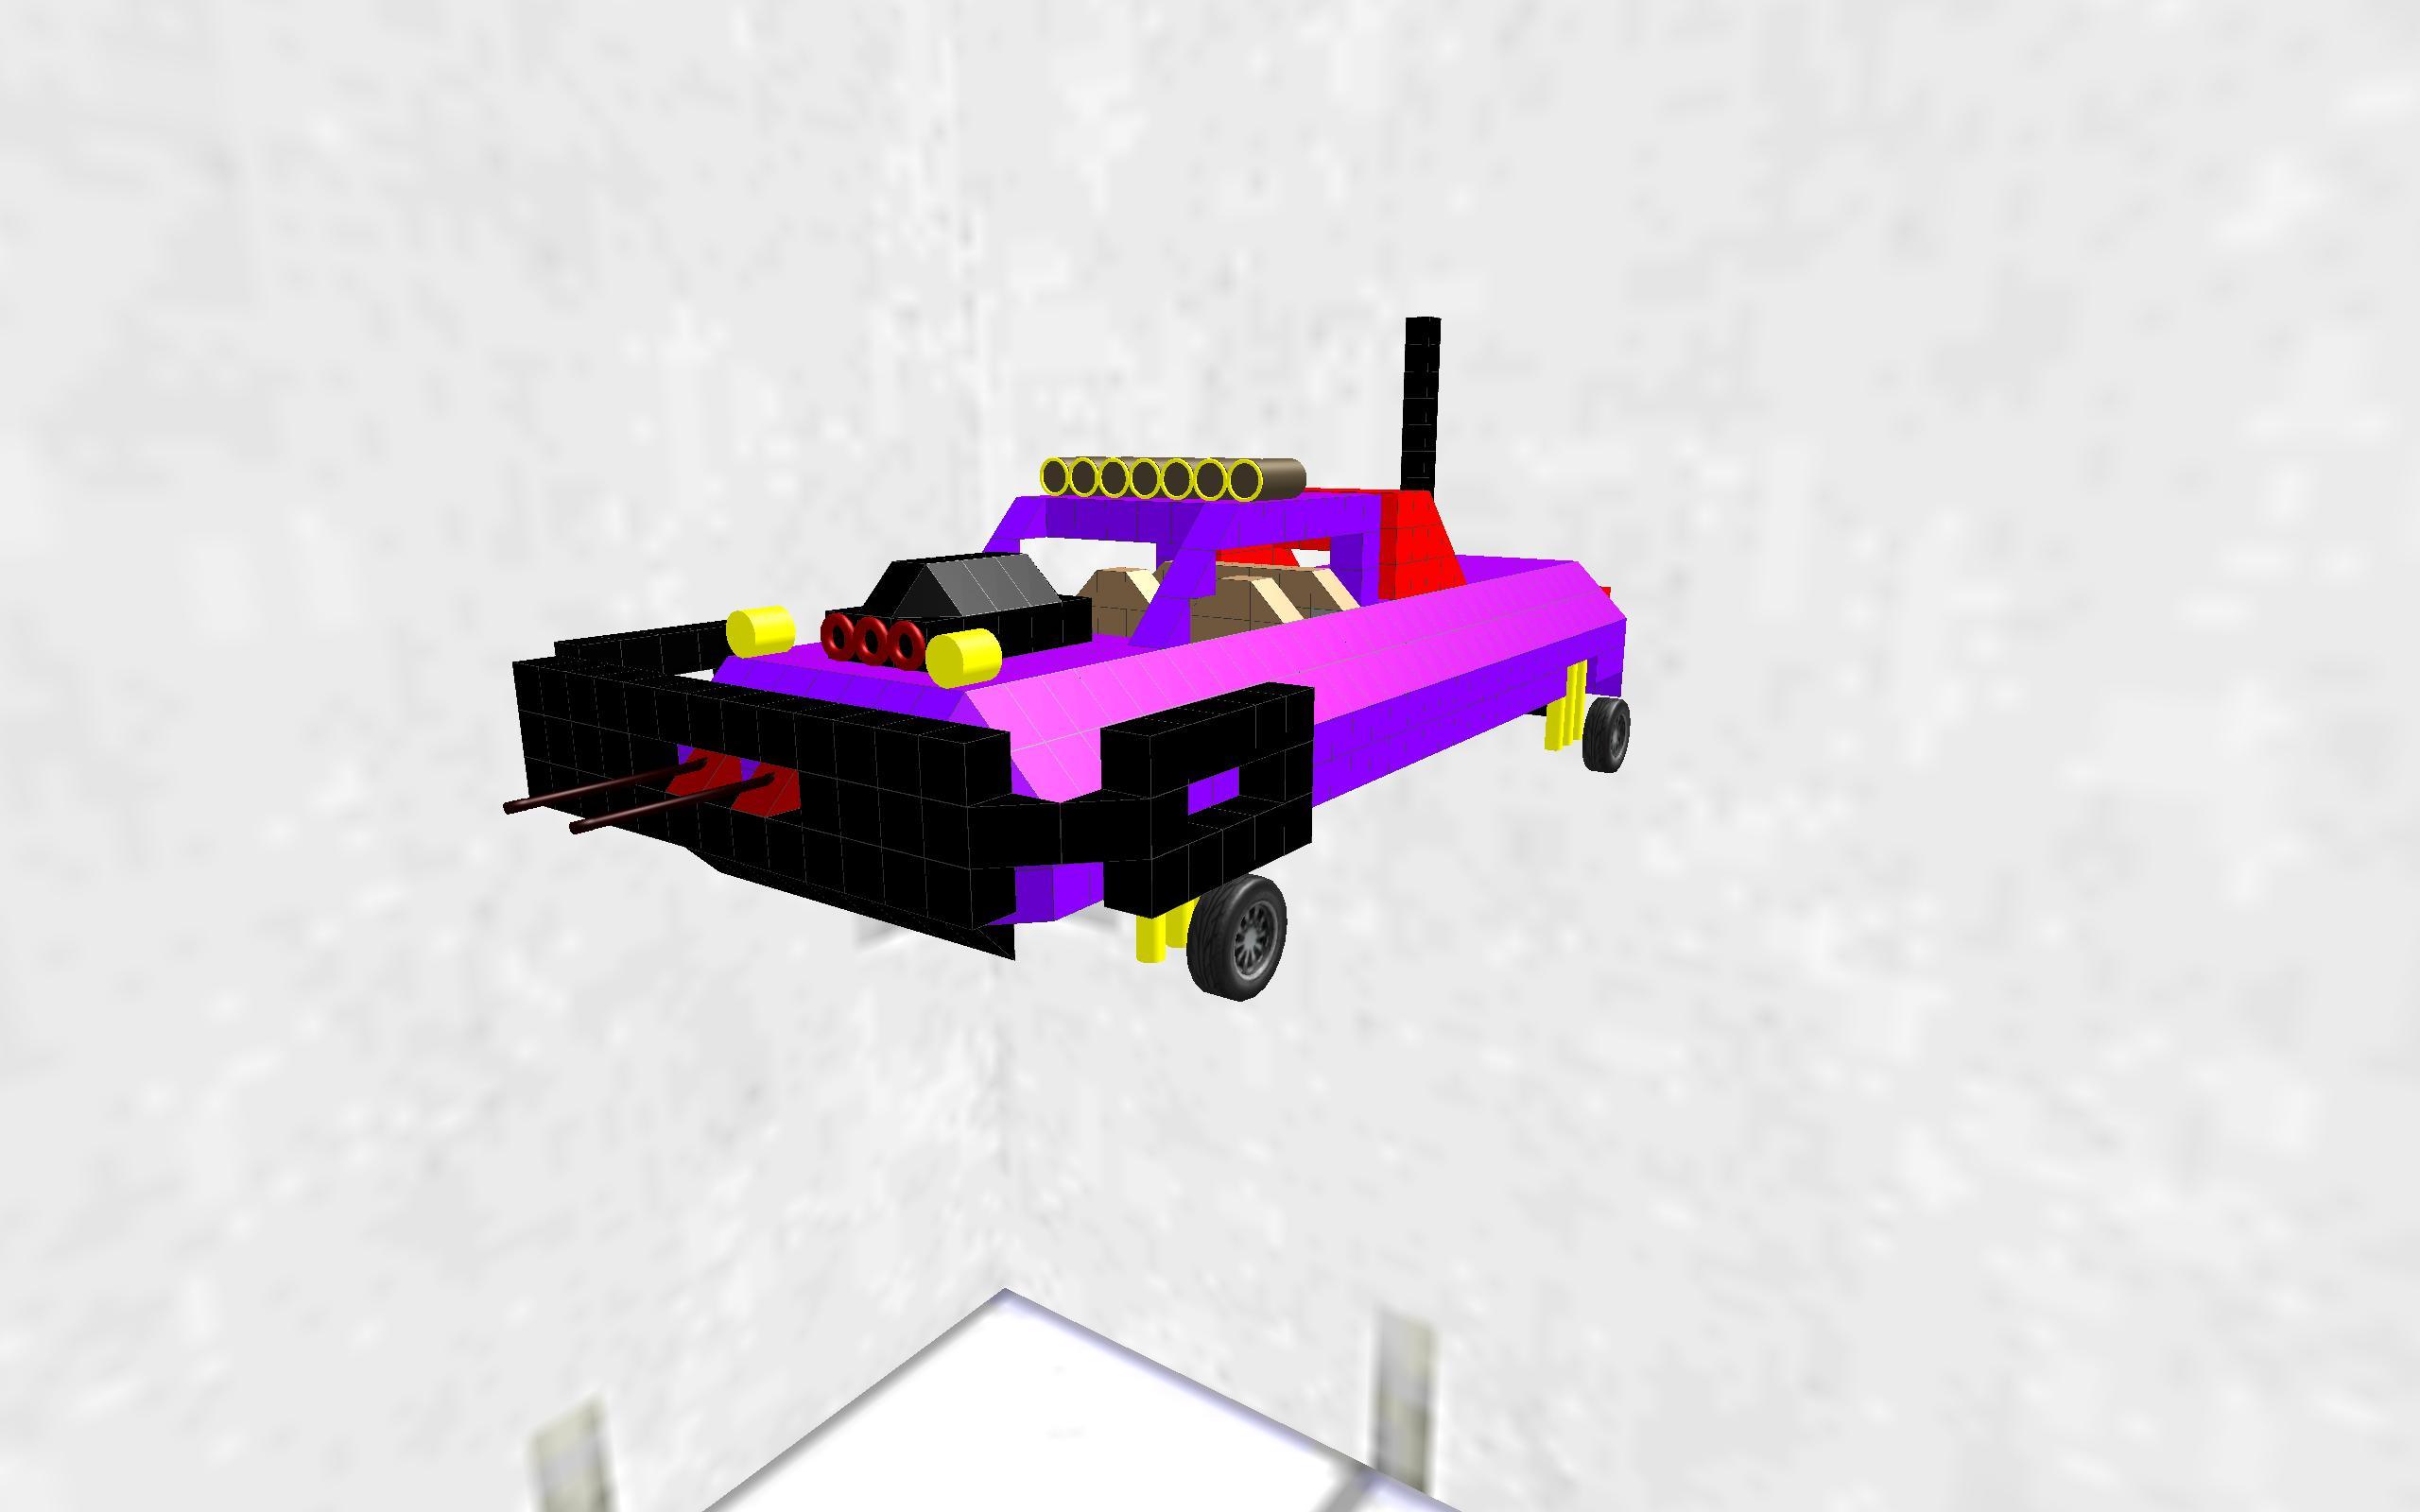 4X4 range rover defender